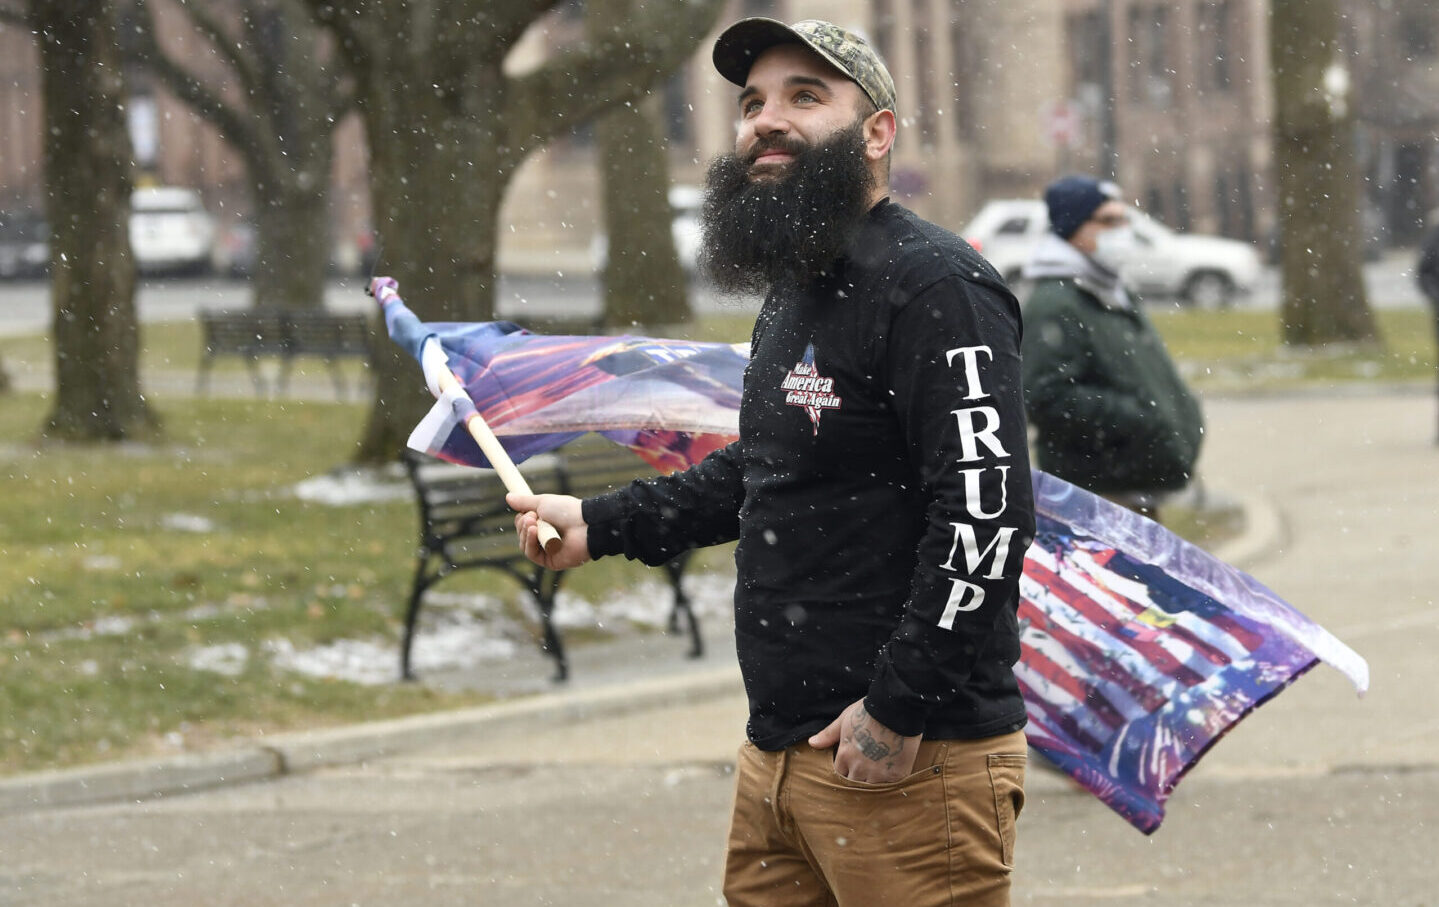 Lone-protester-inauguration-ap